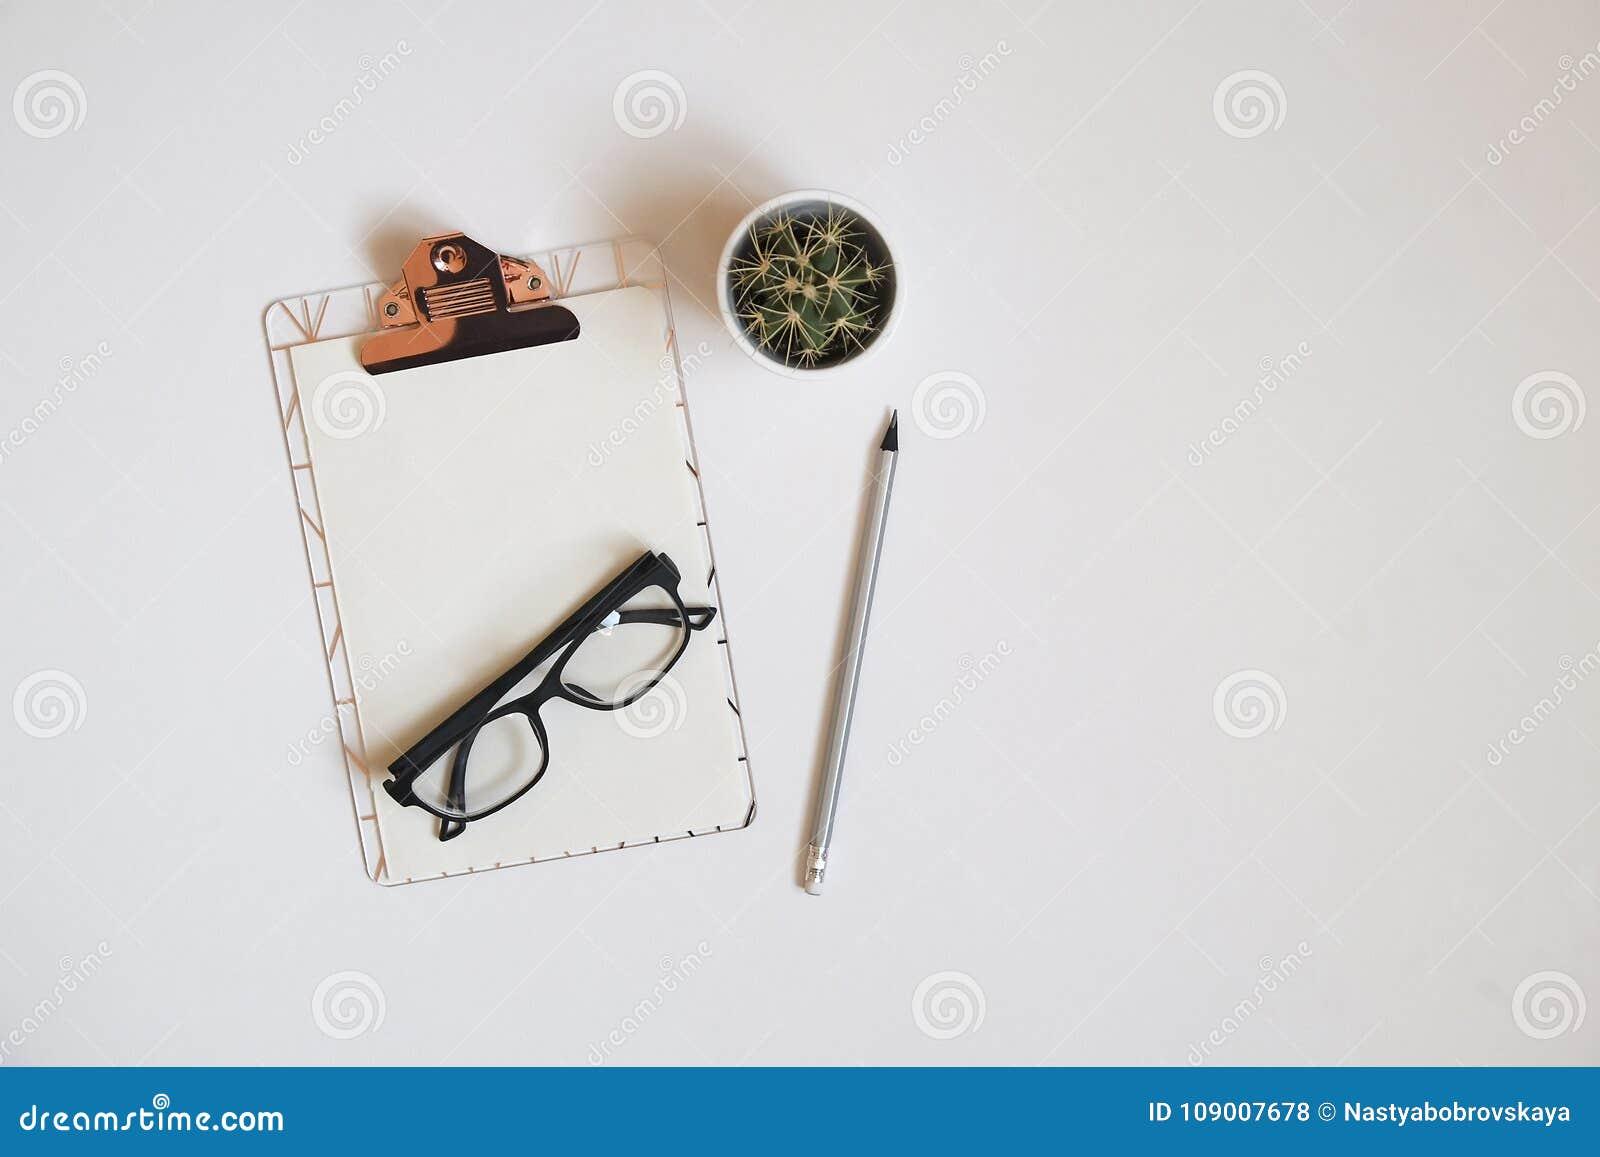 Girlie Set Of School Supplies With Plain Pencil Pen, Blank